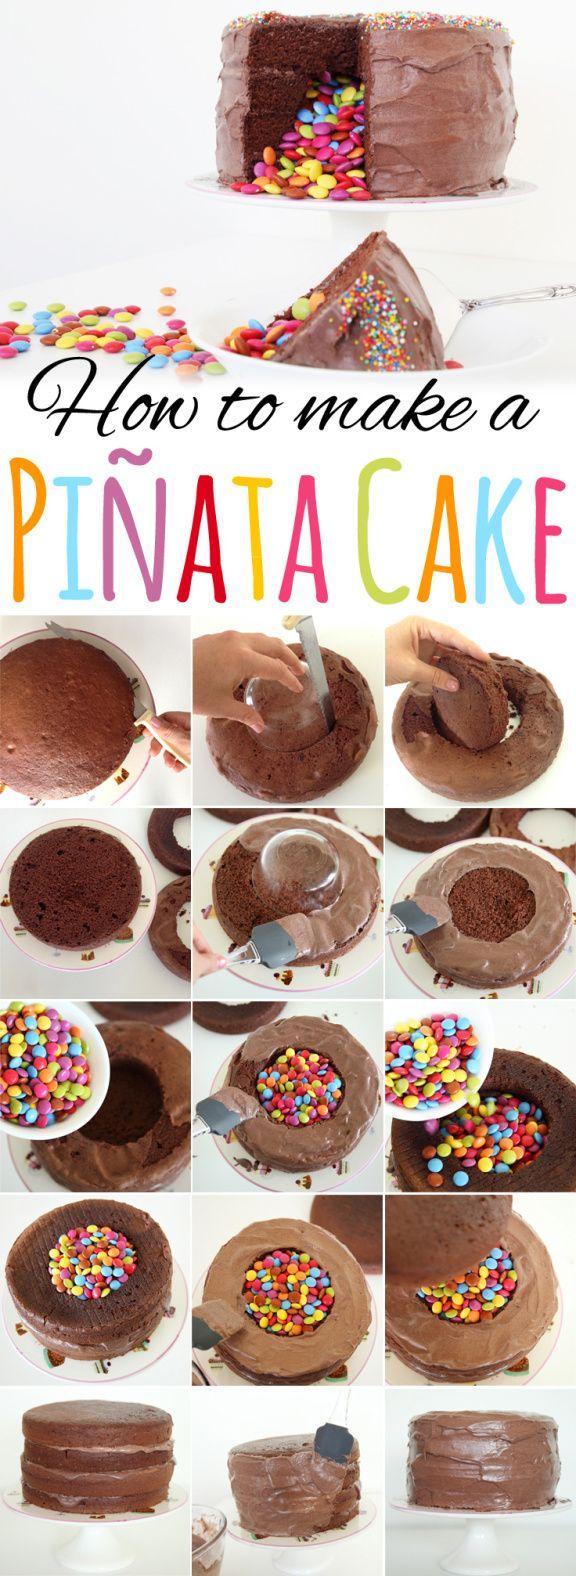 Food Design How To Make A Pinata Cake